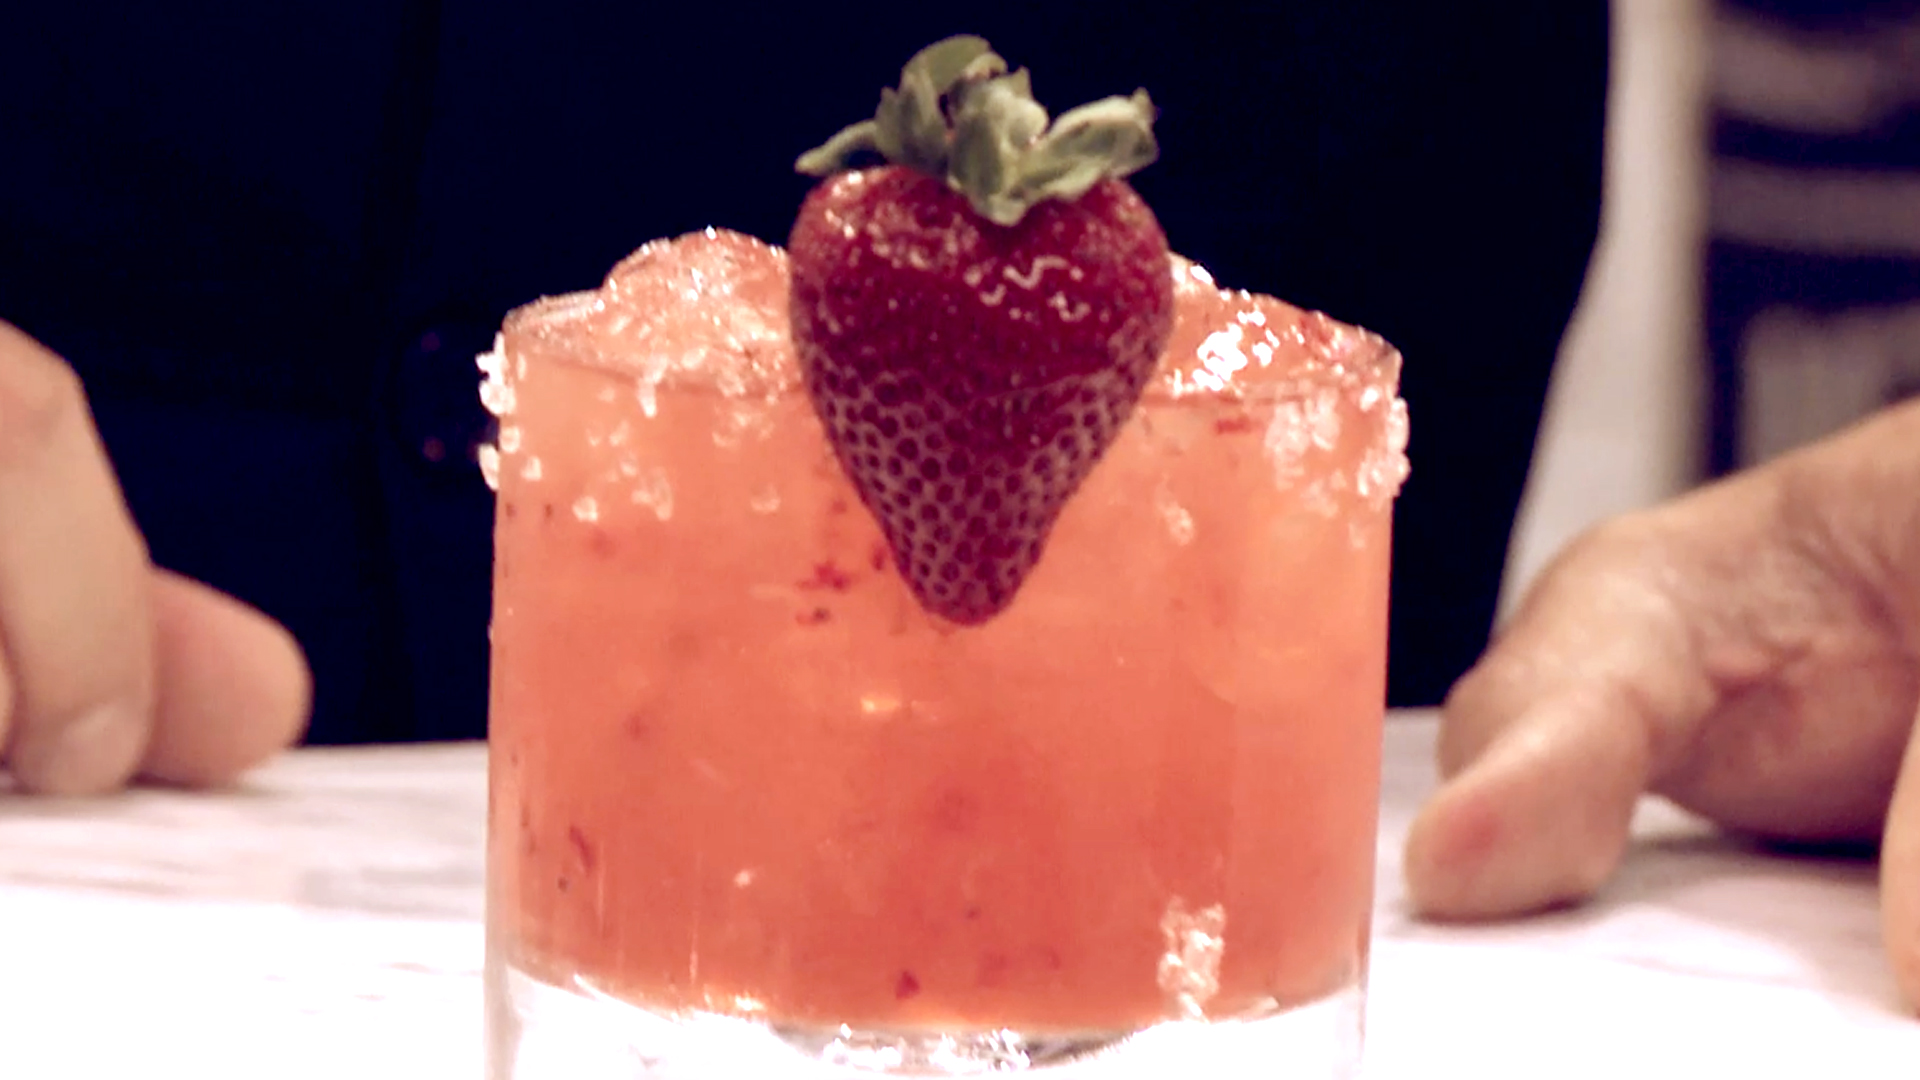 How to Make a Valentine's Day Strawberry Margarita